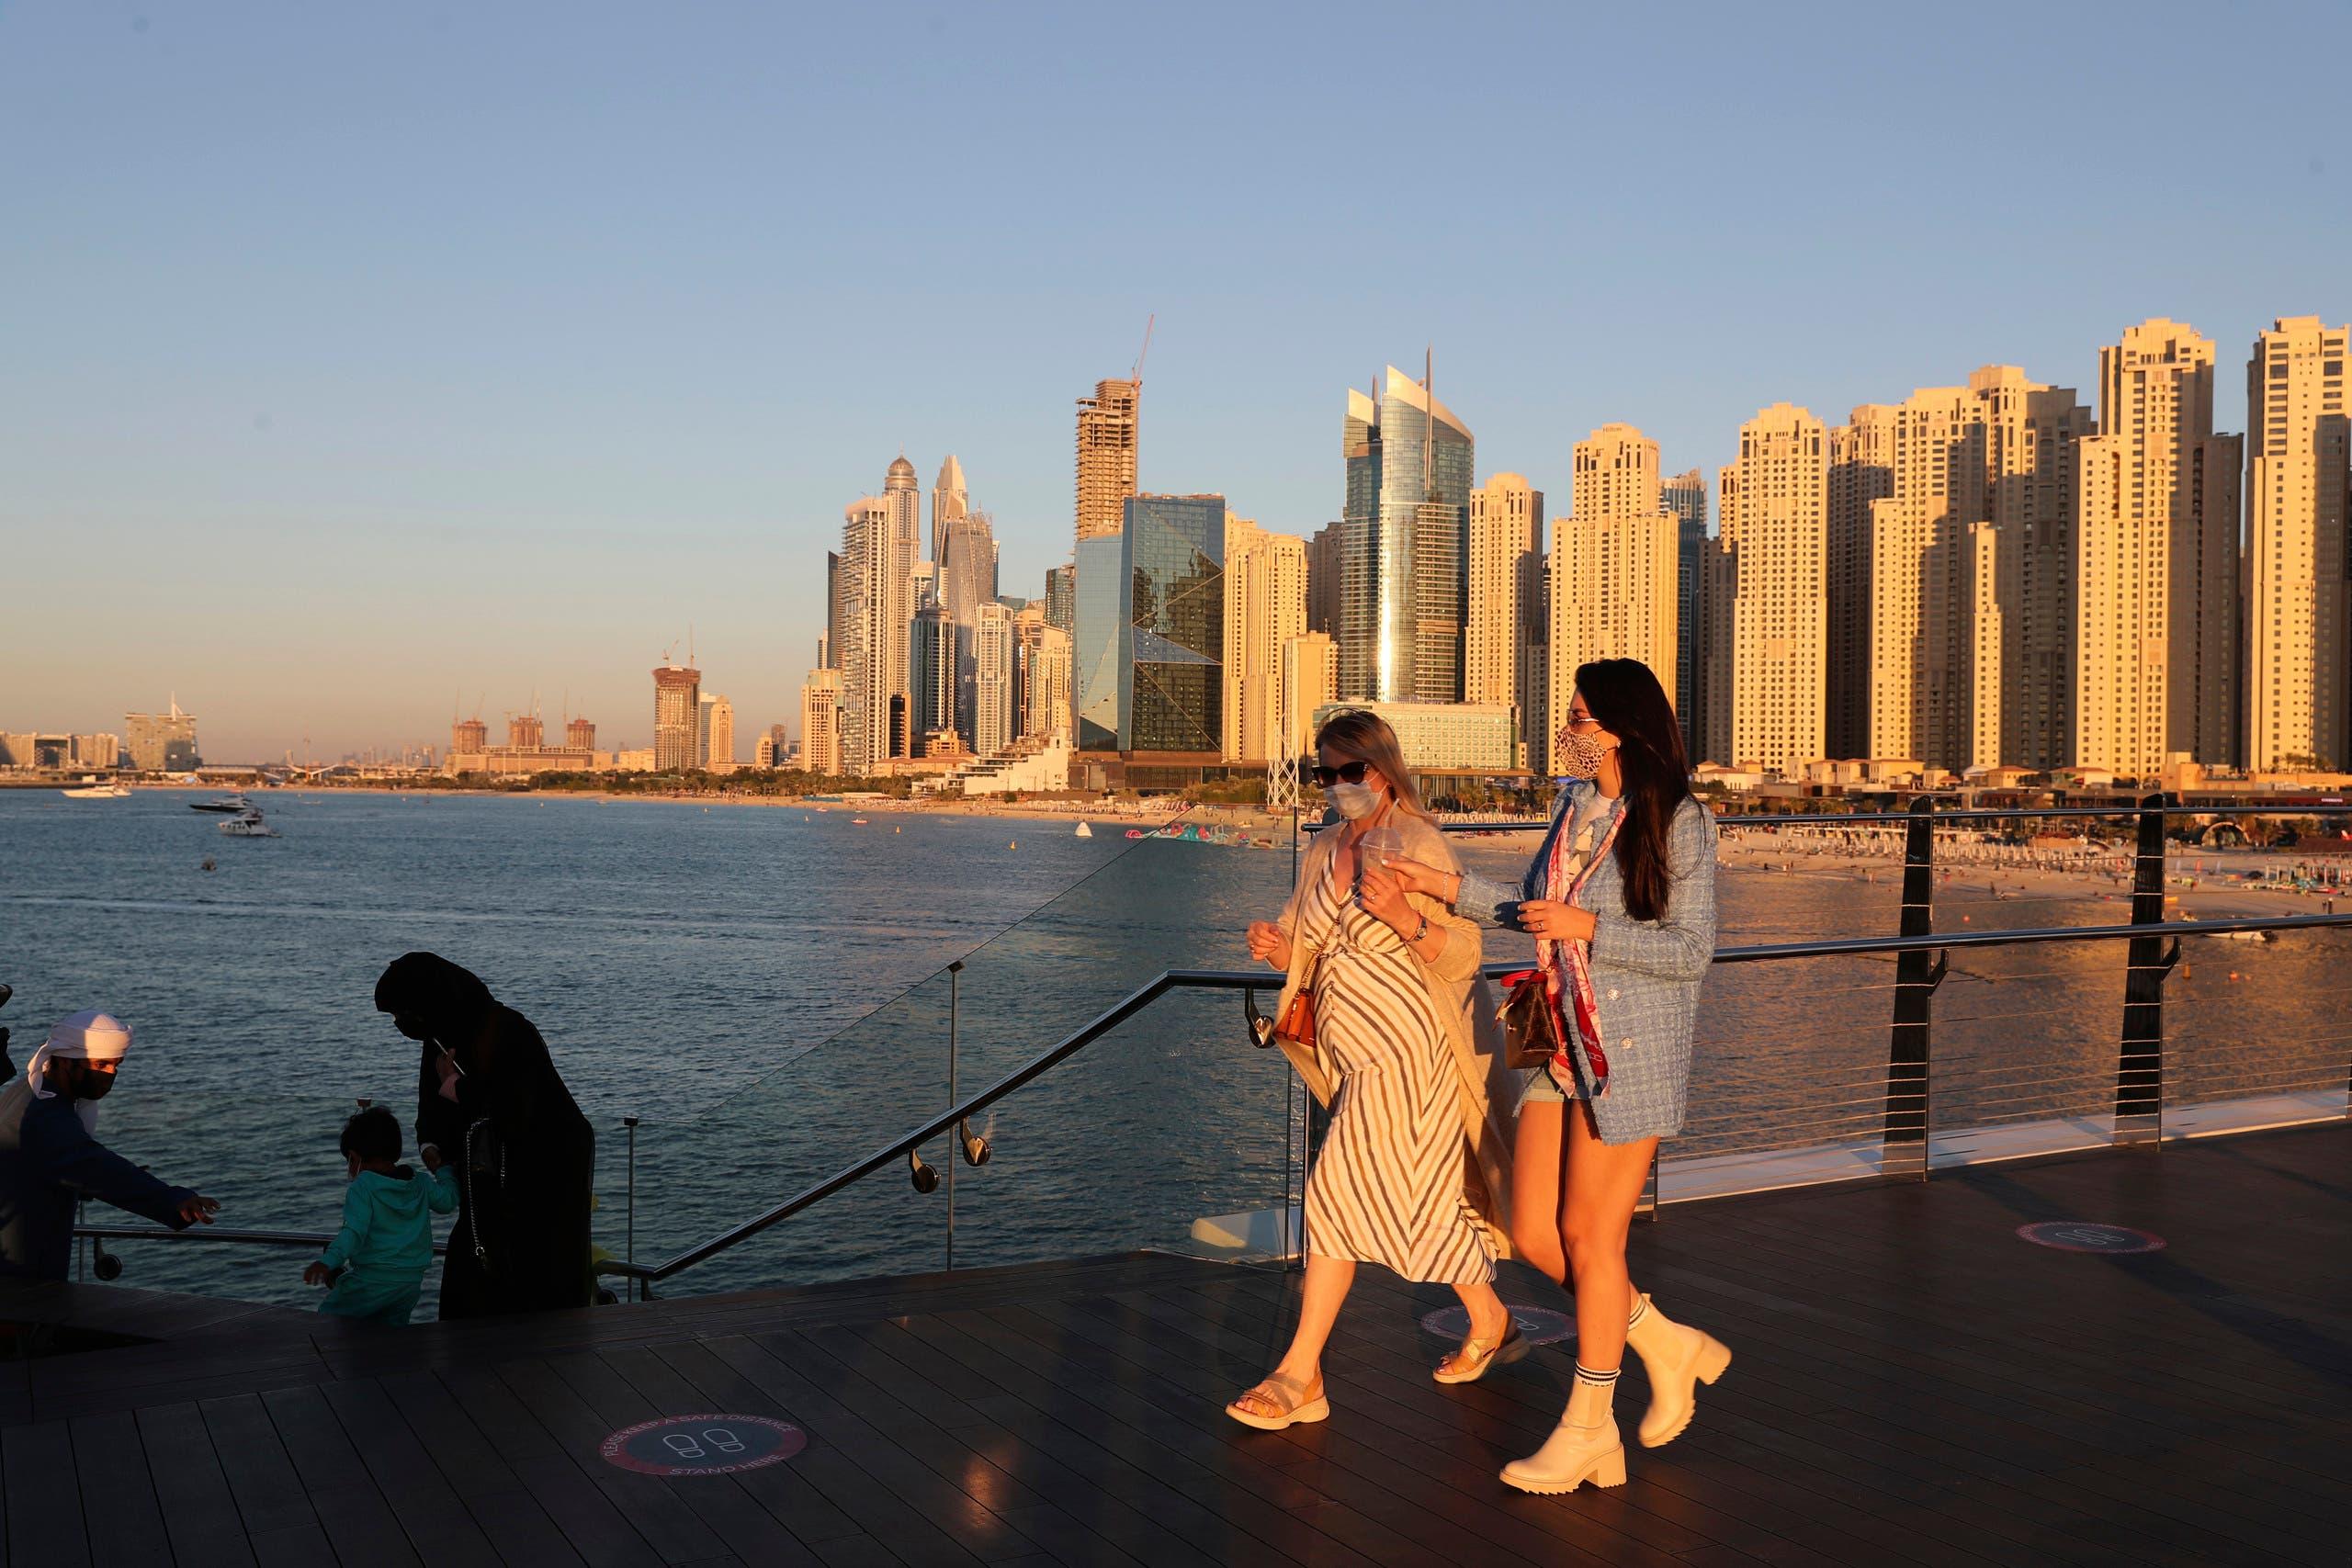 Tourists walk by an Emirati family in Dubai on Jan. 12, 2021. (AP)